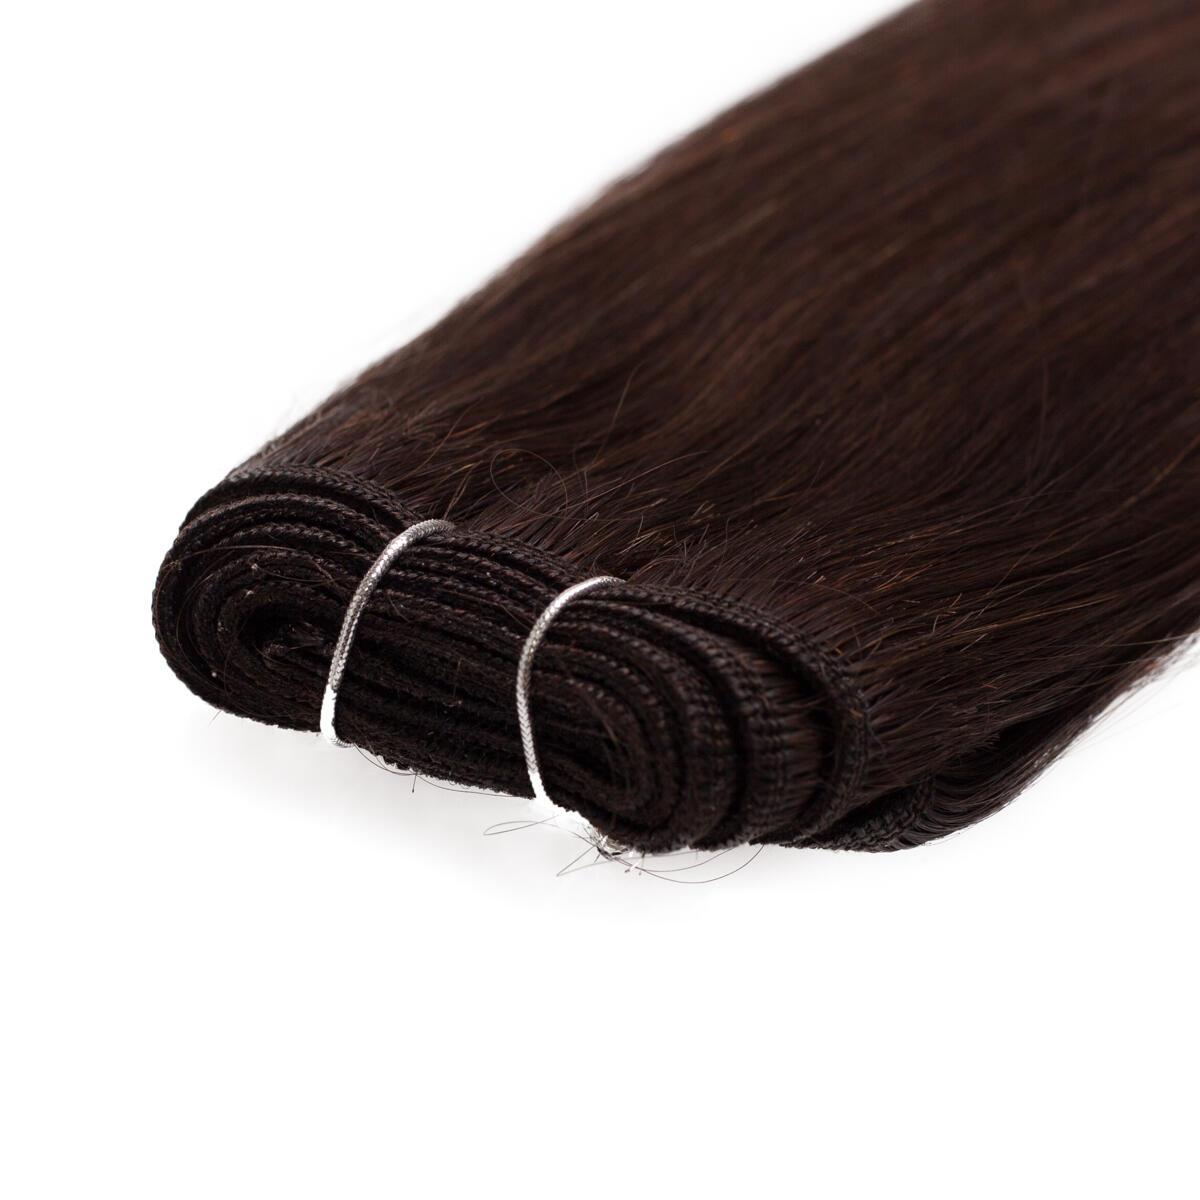 Haartresse Premium Glatt 2.3 Chocolate Brown 50 cm